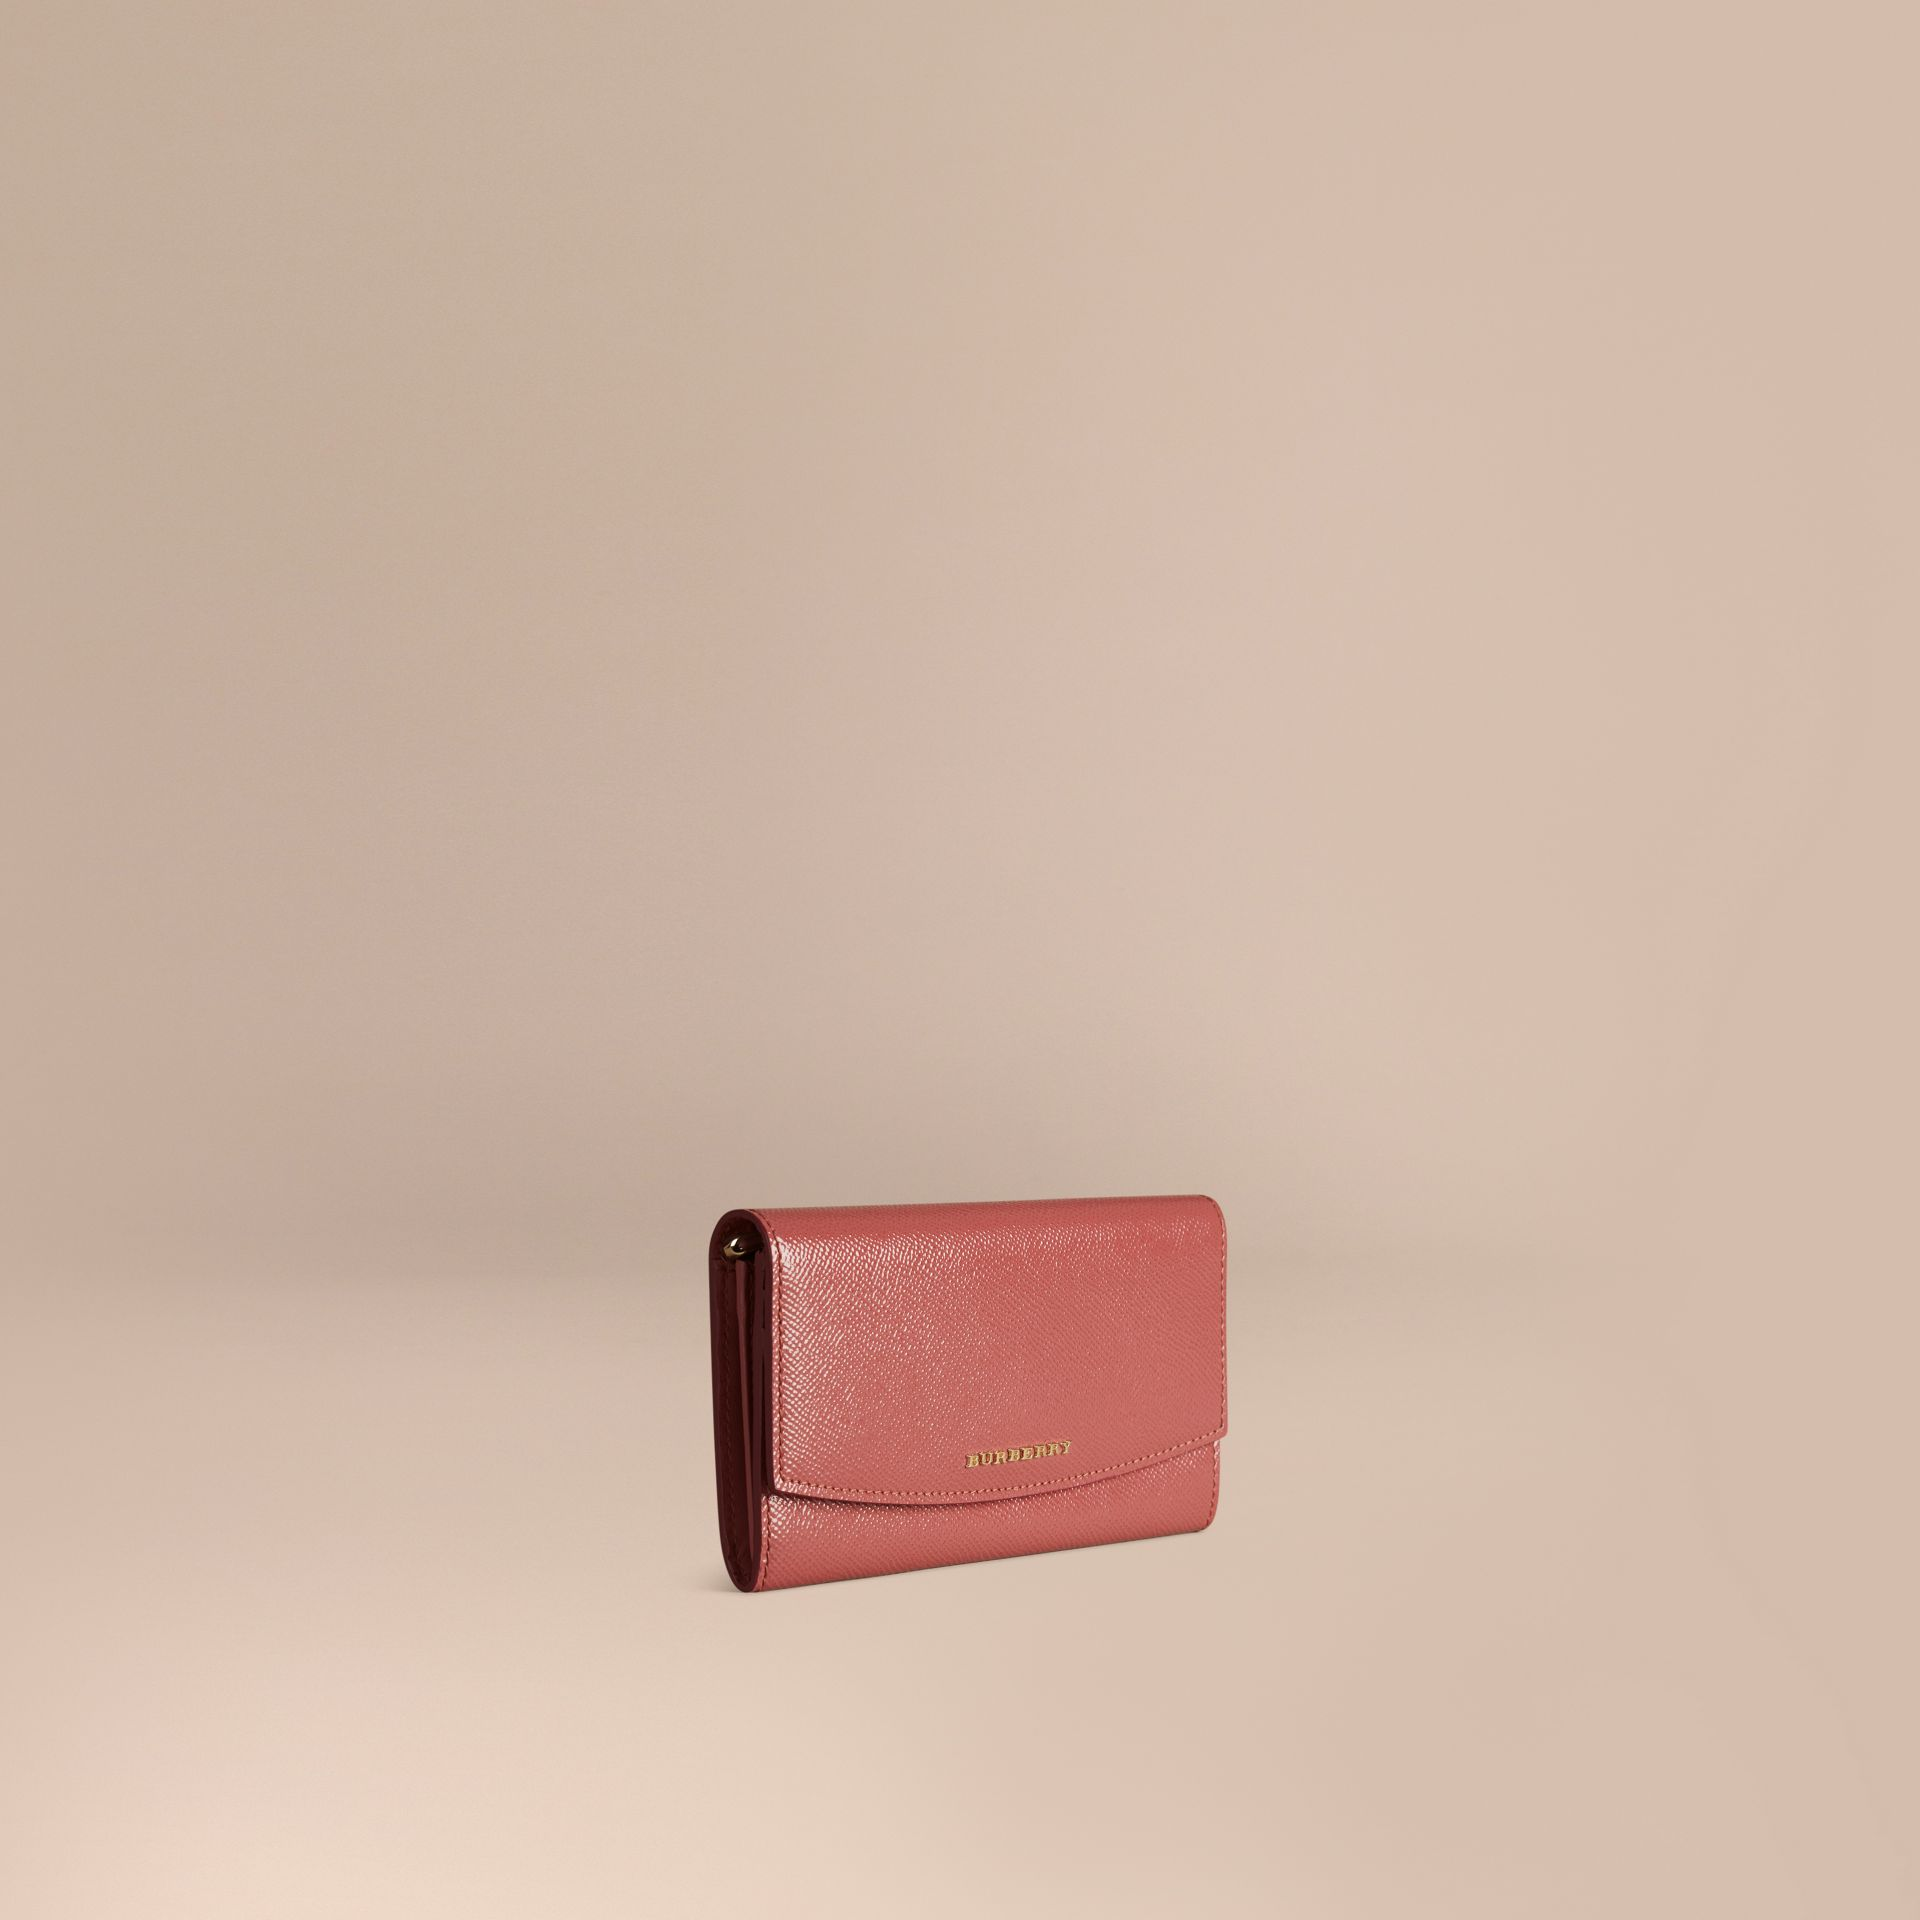 Antikrosa Brieftasche aus London-Lackleder im Kontinentalformat Antikrosa - Galerie-Bild 1